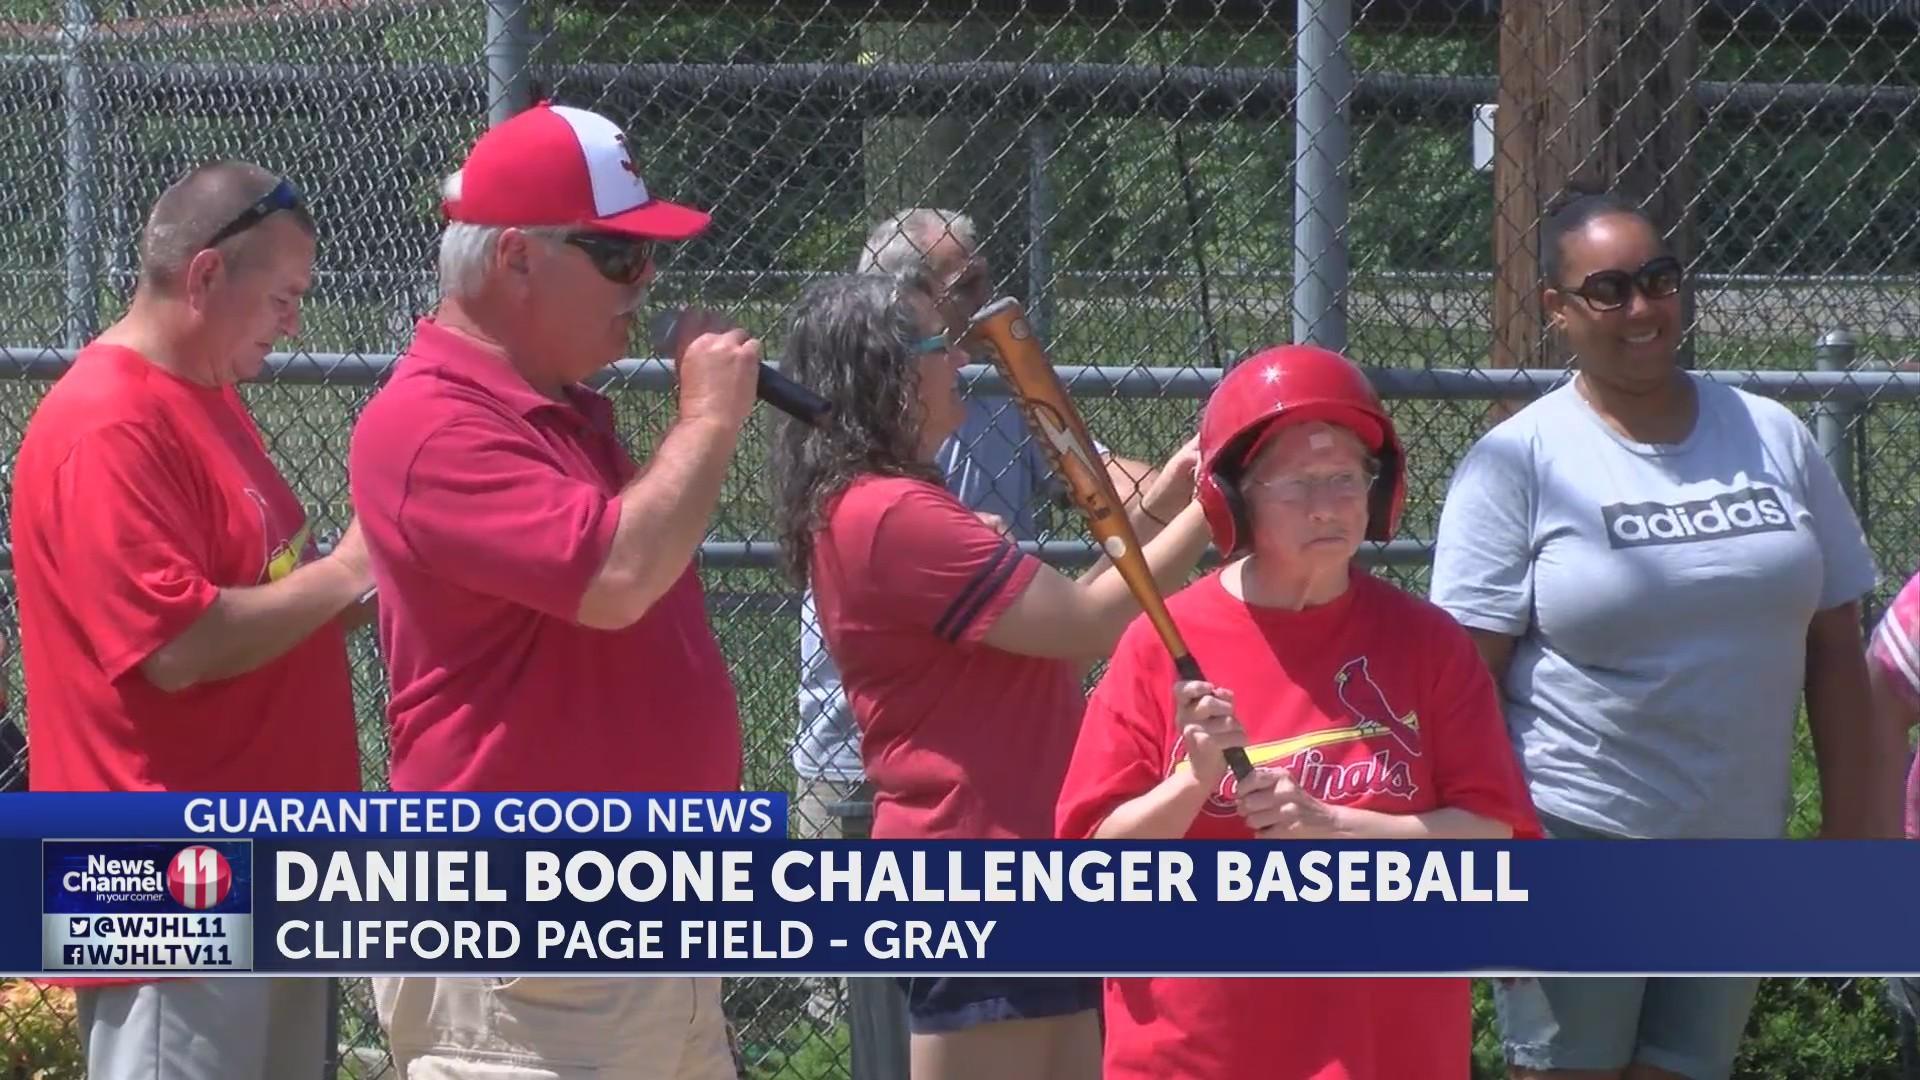 Daniel Boone Challenger League